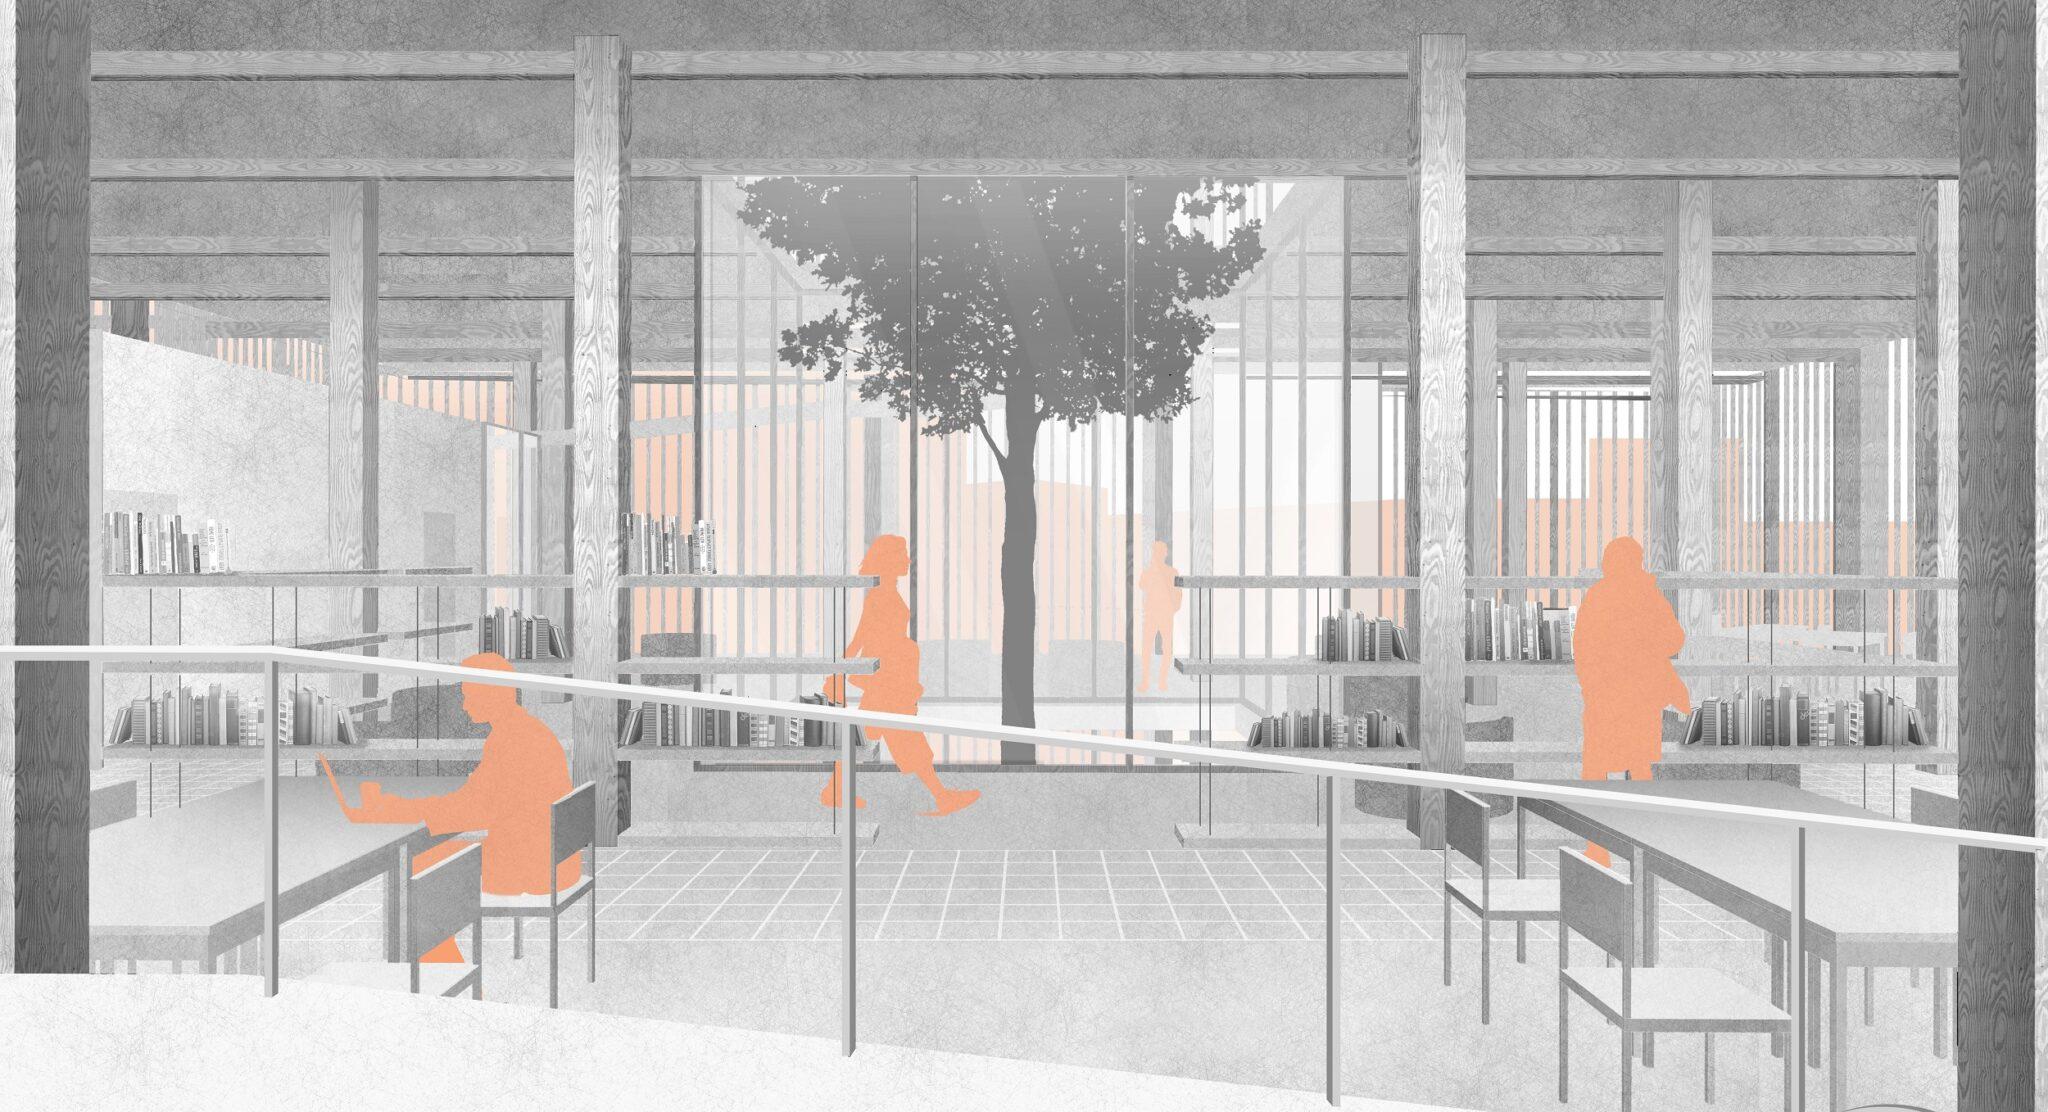 POINT OF INCLUSION – Student Community Centre in Amsterdam / Dasha Naumochkina